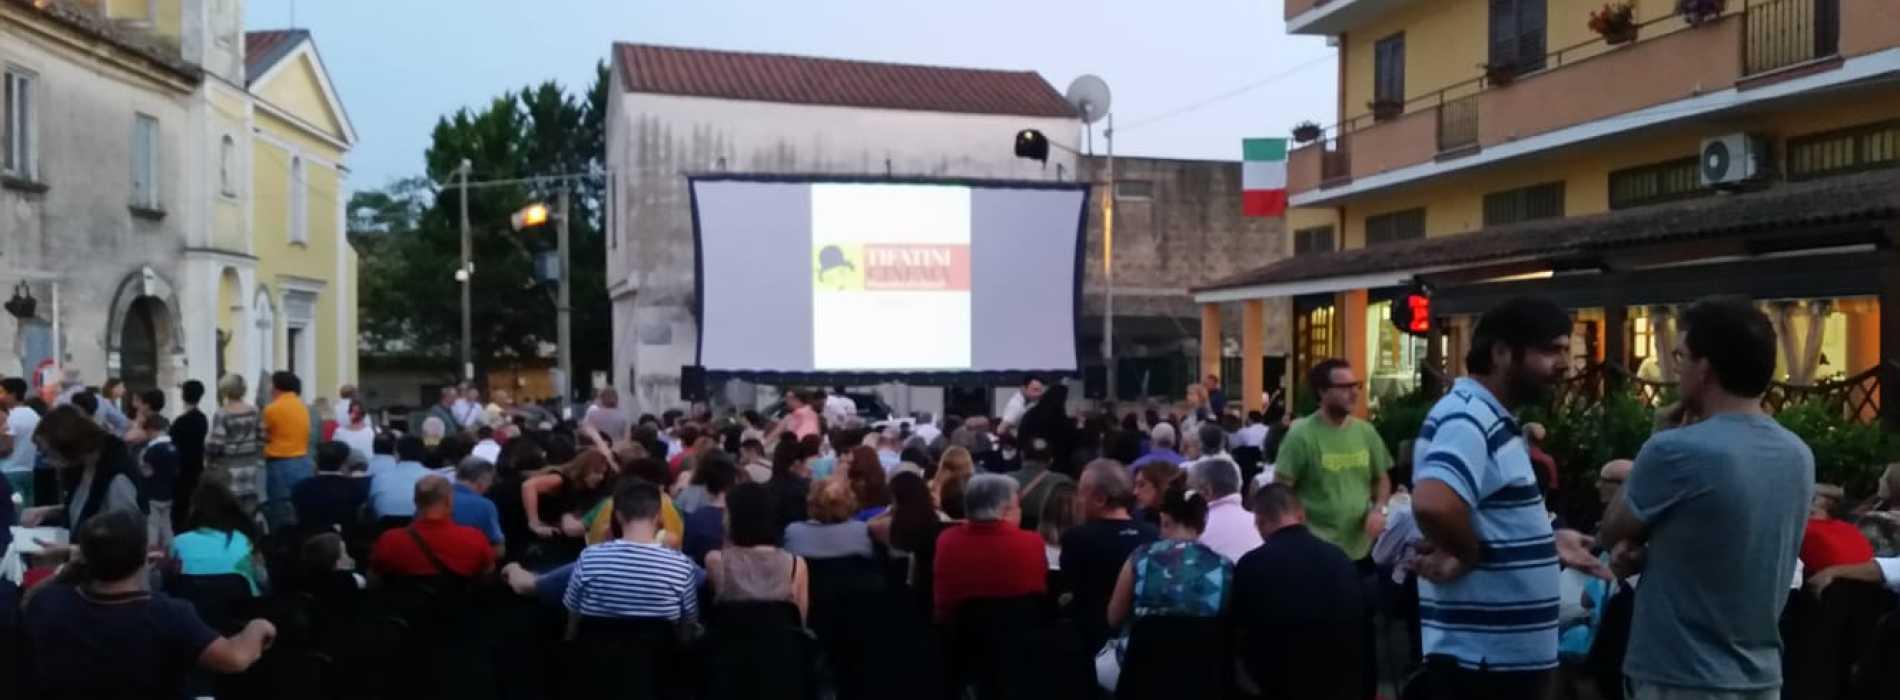 Tifatini Cinema, la rassegna in collina chiude nel week end